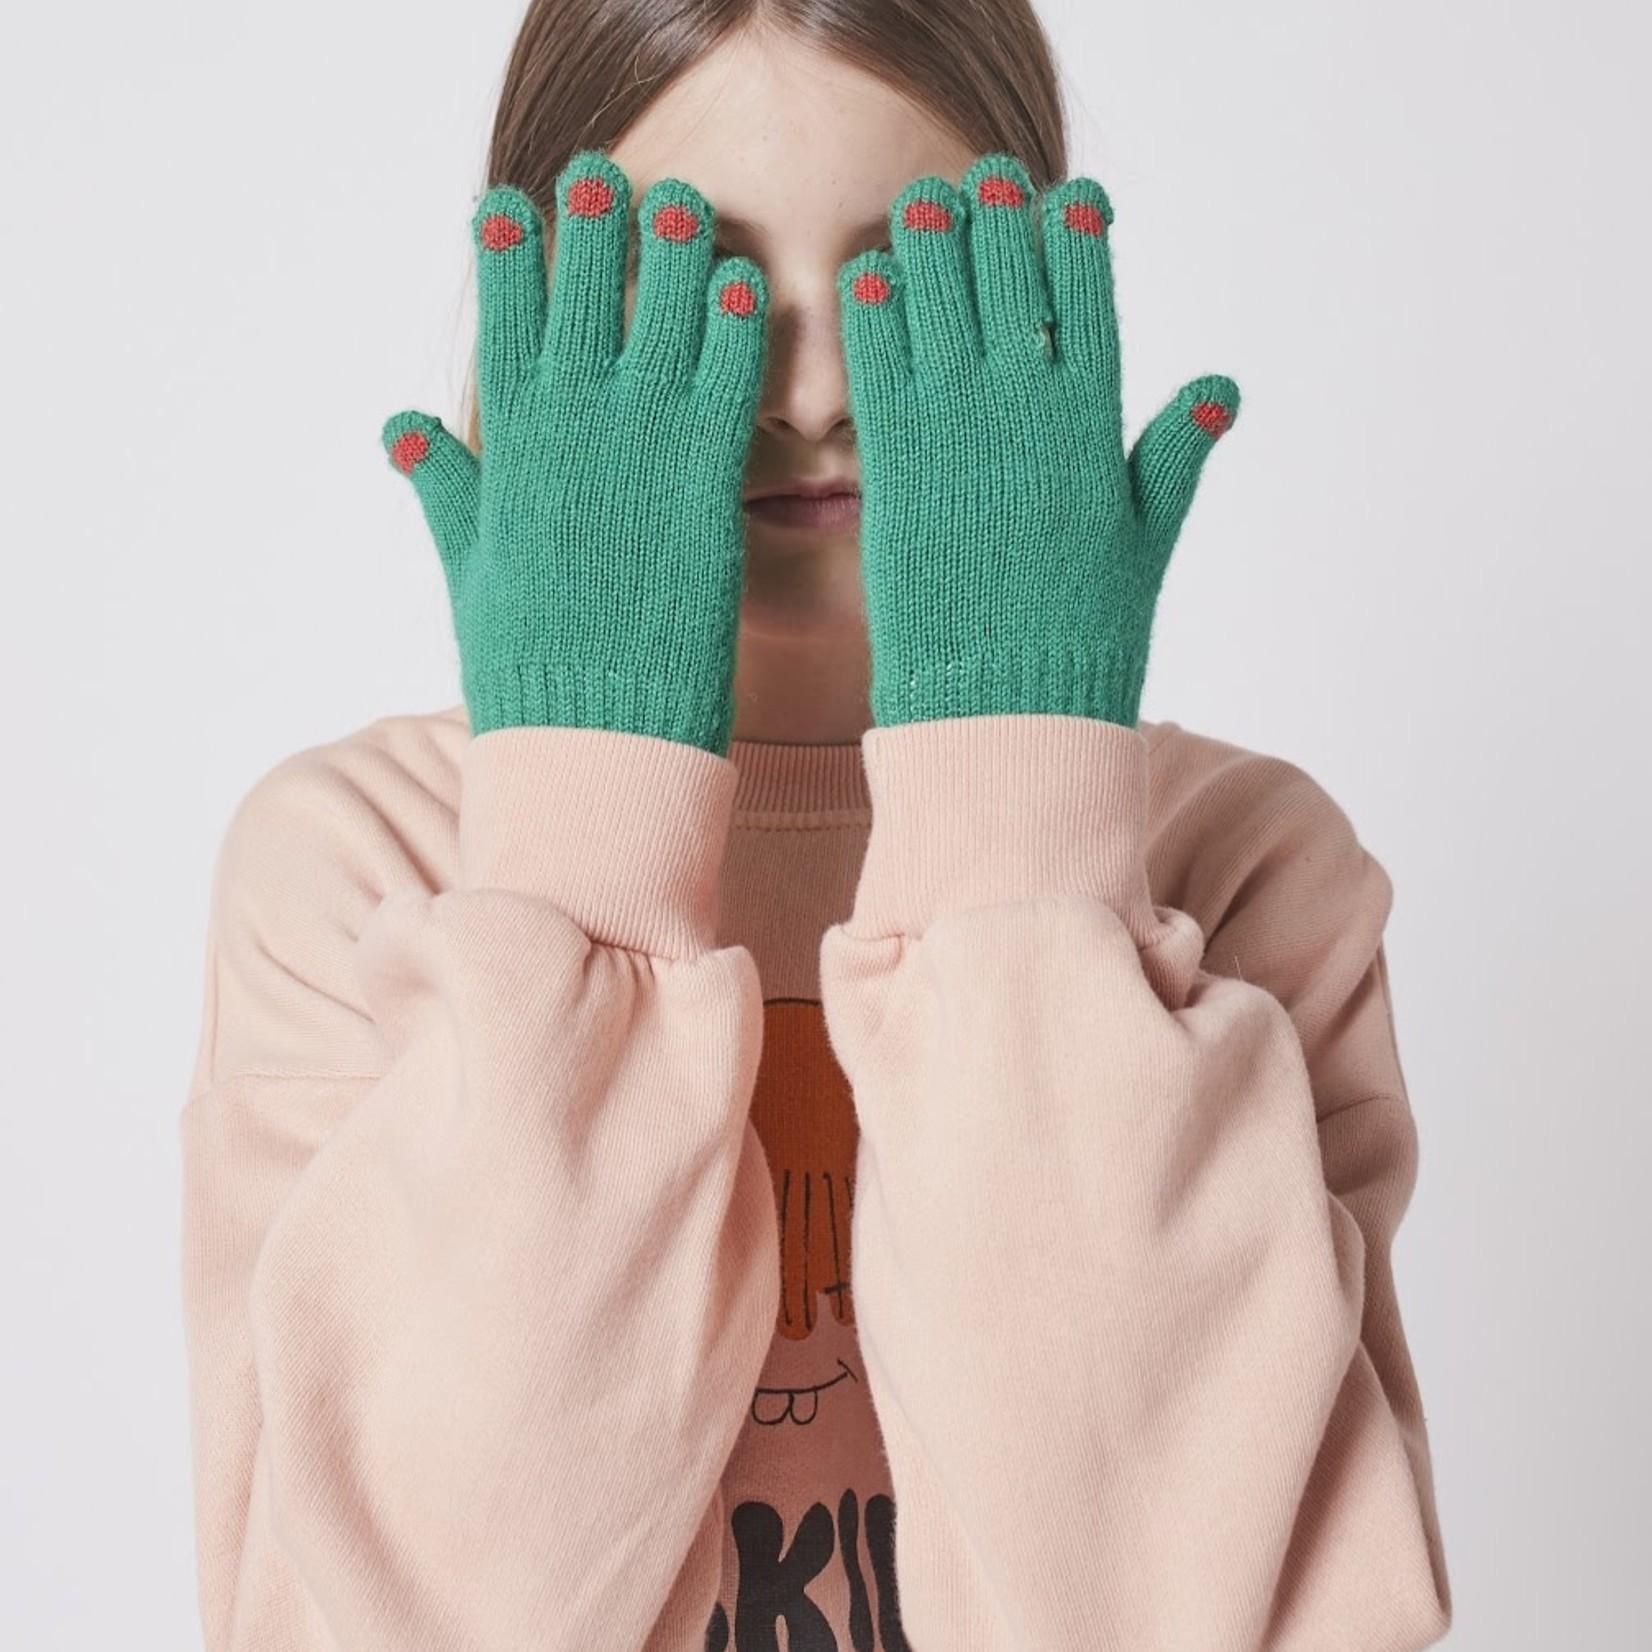 BOBO CHOSES BOBO CHOSES  hands green knitted gloves